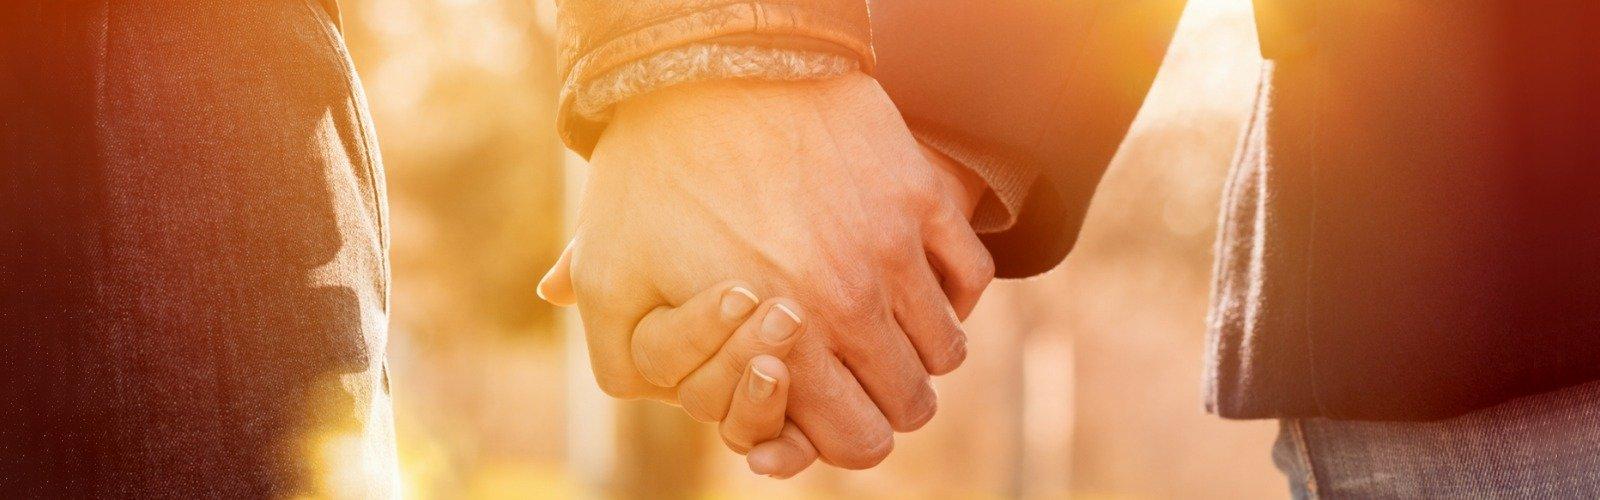 two hands holding sunset lighting